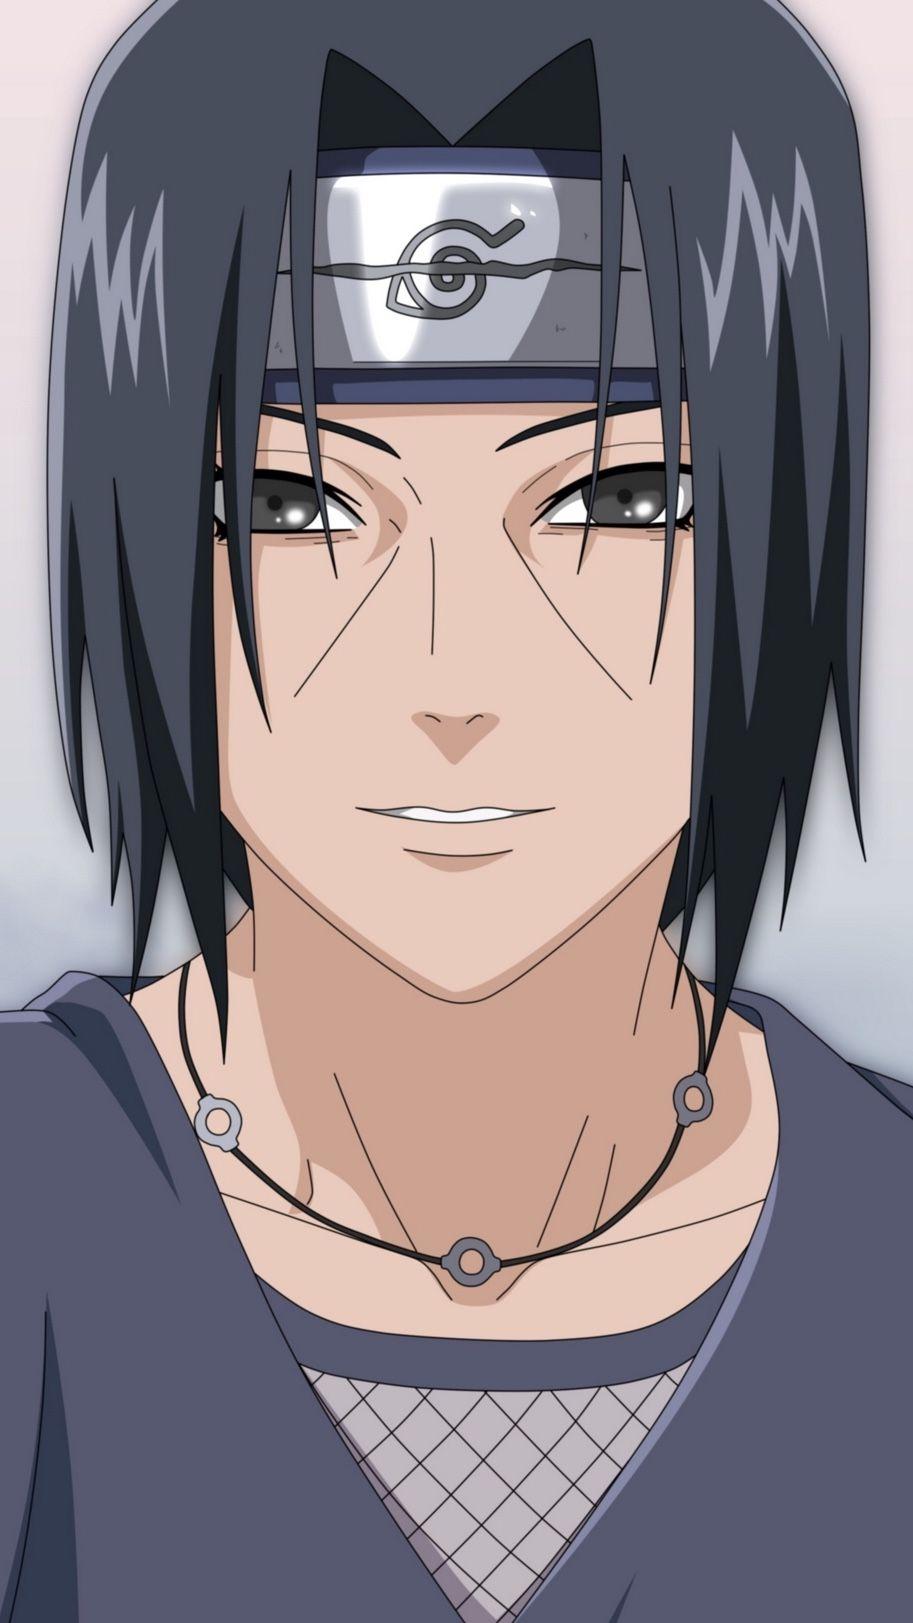 Check The Link To Download Hd Wallpapers Of Naruto And More Pc Phone Anime Naruto Authors Masashi In 2020 Itachi Uchiha Art Naruto Shippuden Anime Itachi